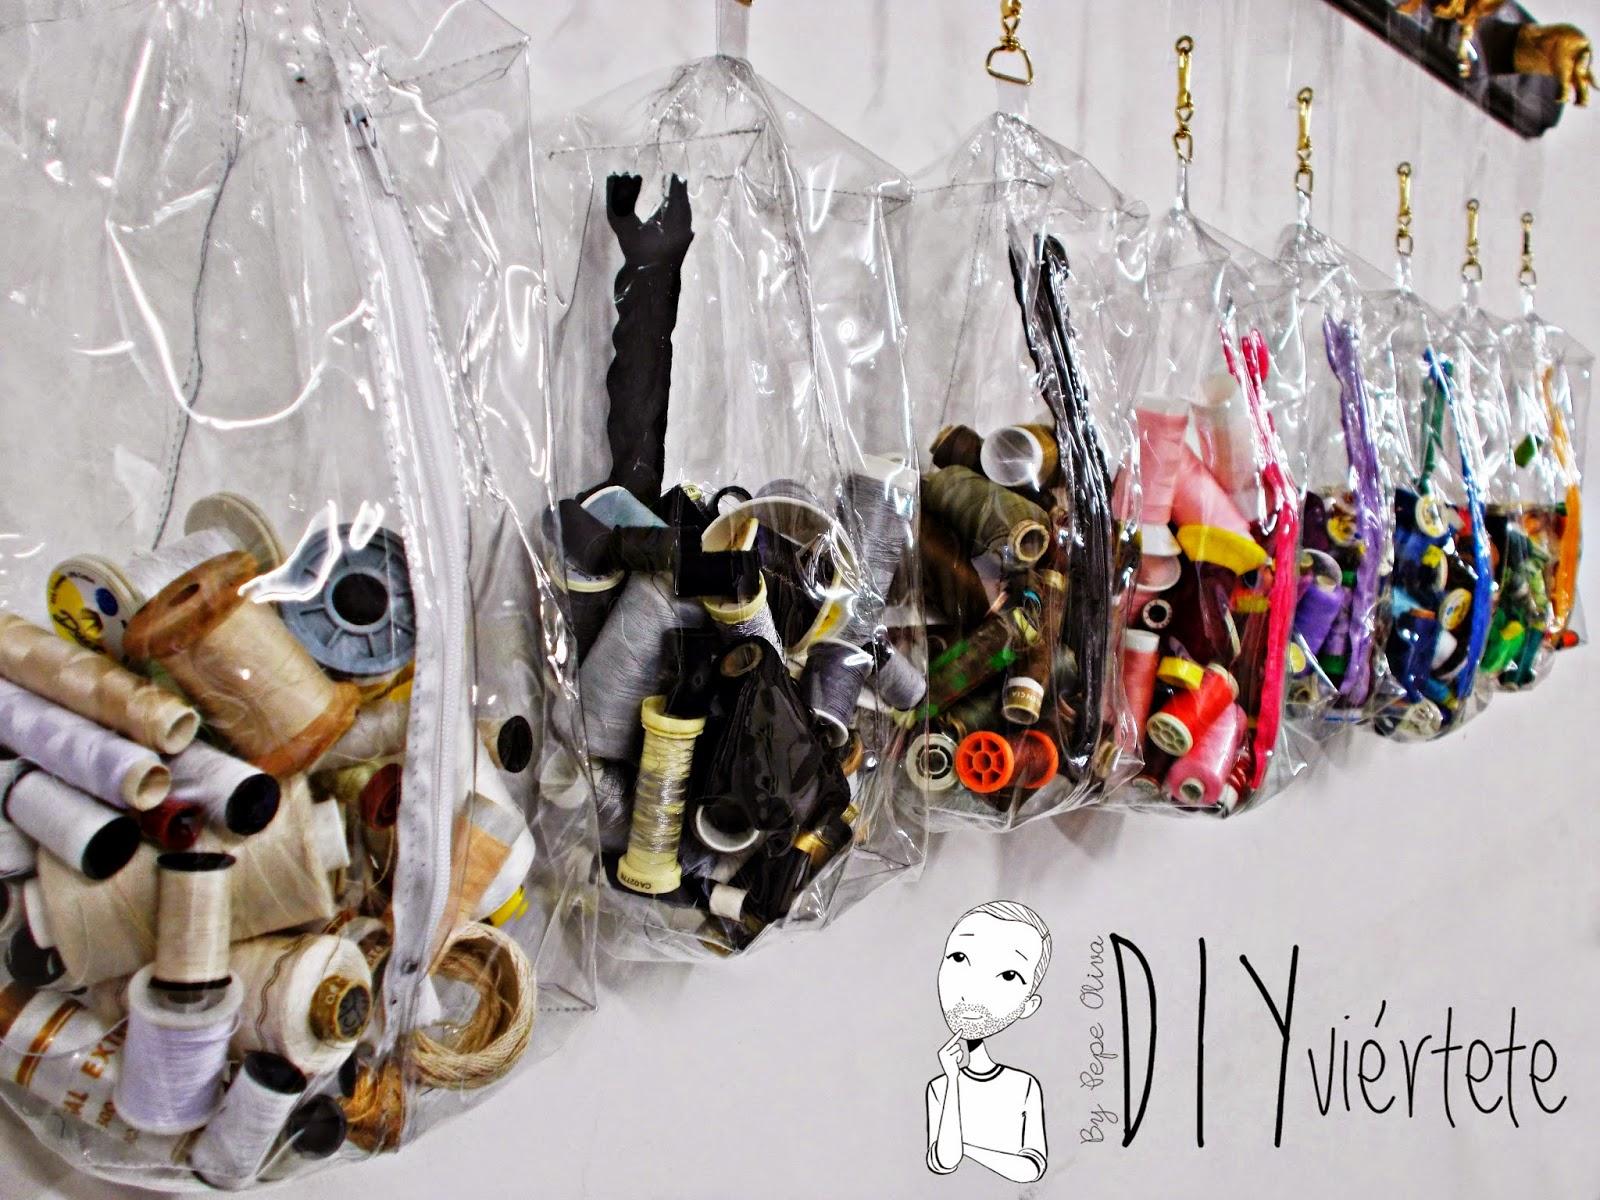 DIY-valisette-trasparente-neceser-hule-guarda hilos-bolsitas-costura-